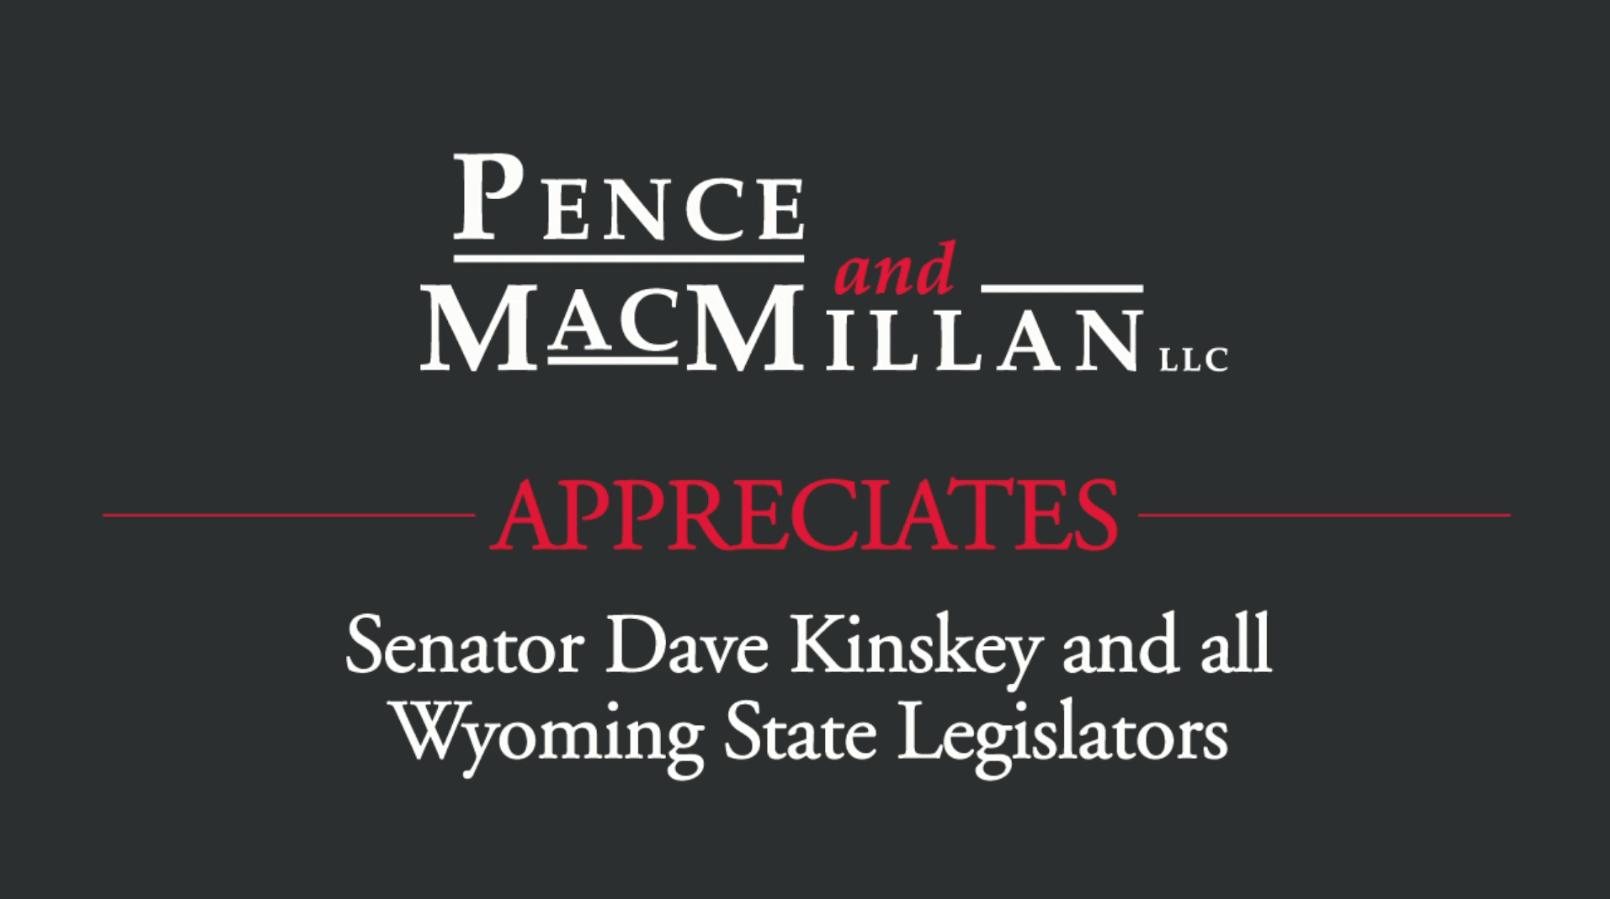 Pence and MacMillan appreciates Senator Dave Kinskey and all Wyoming state legislators.